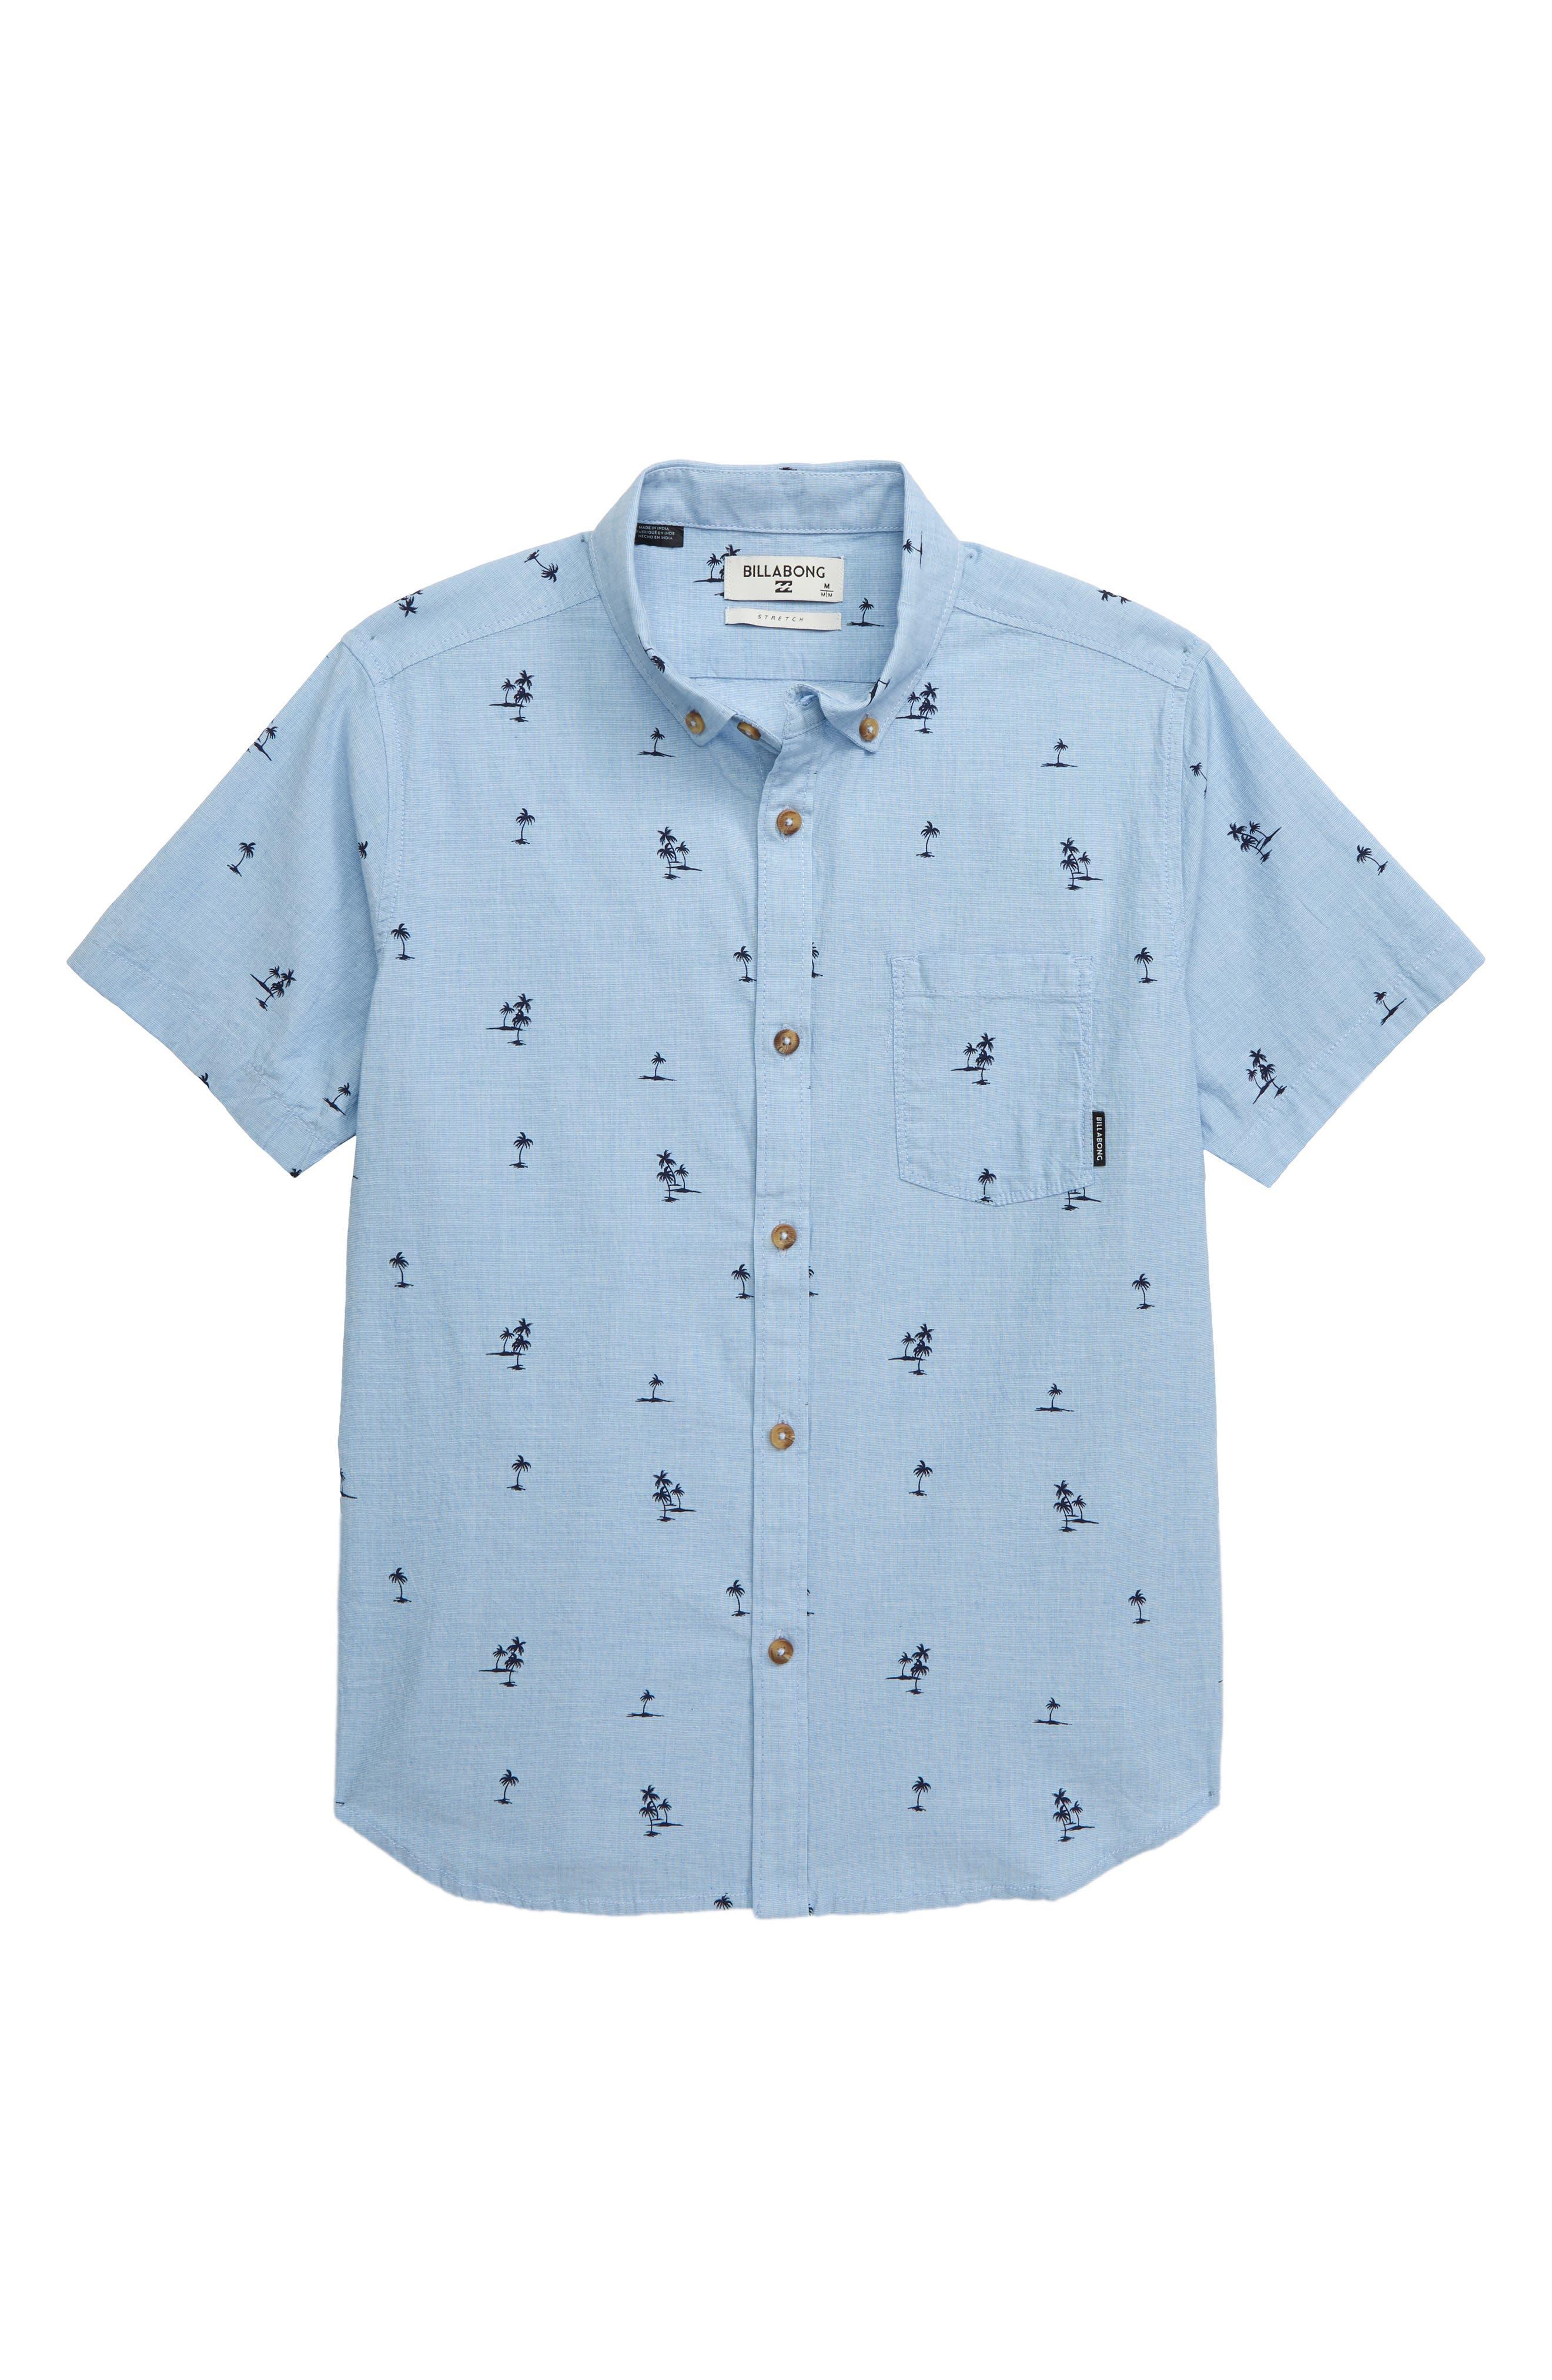 2686039ca2 Billabong Kids  Casual Button-Down Shirts Bathing Suits   Clothes ...